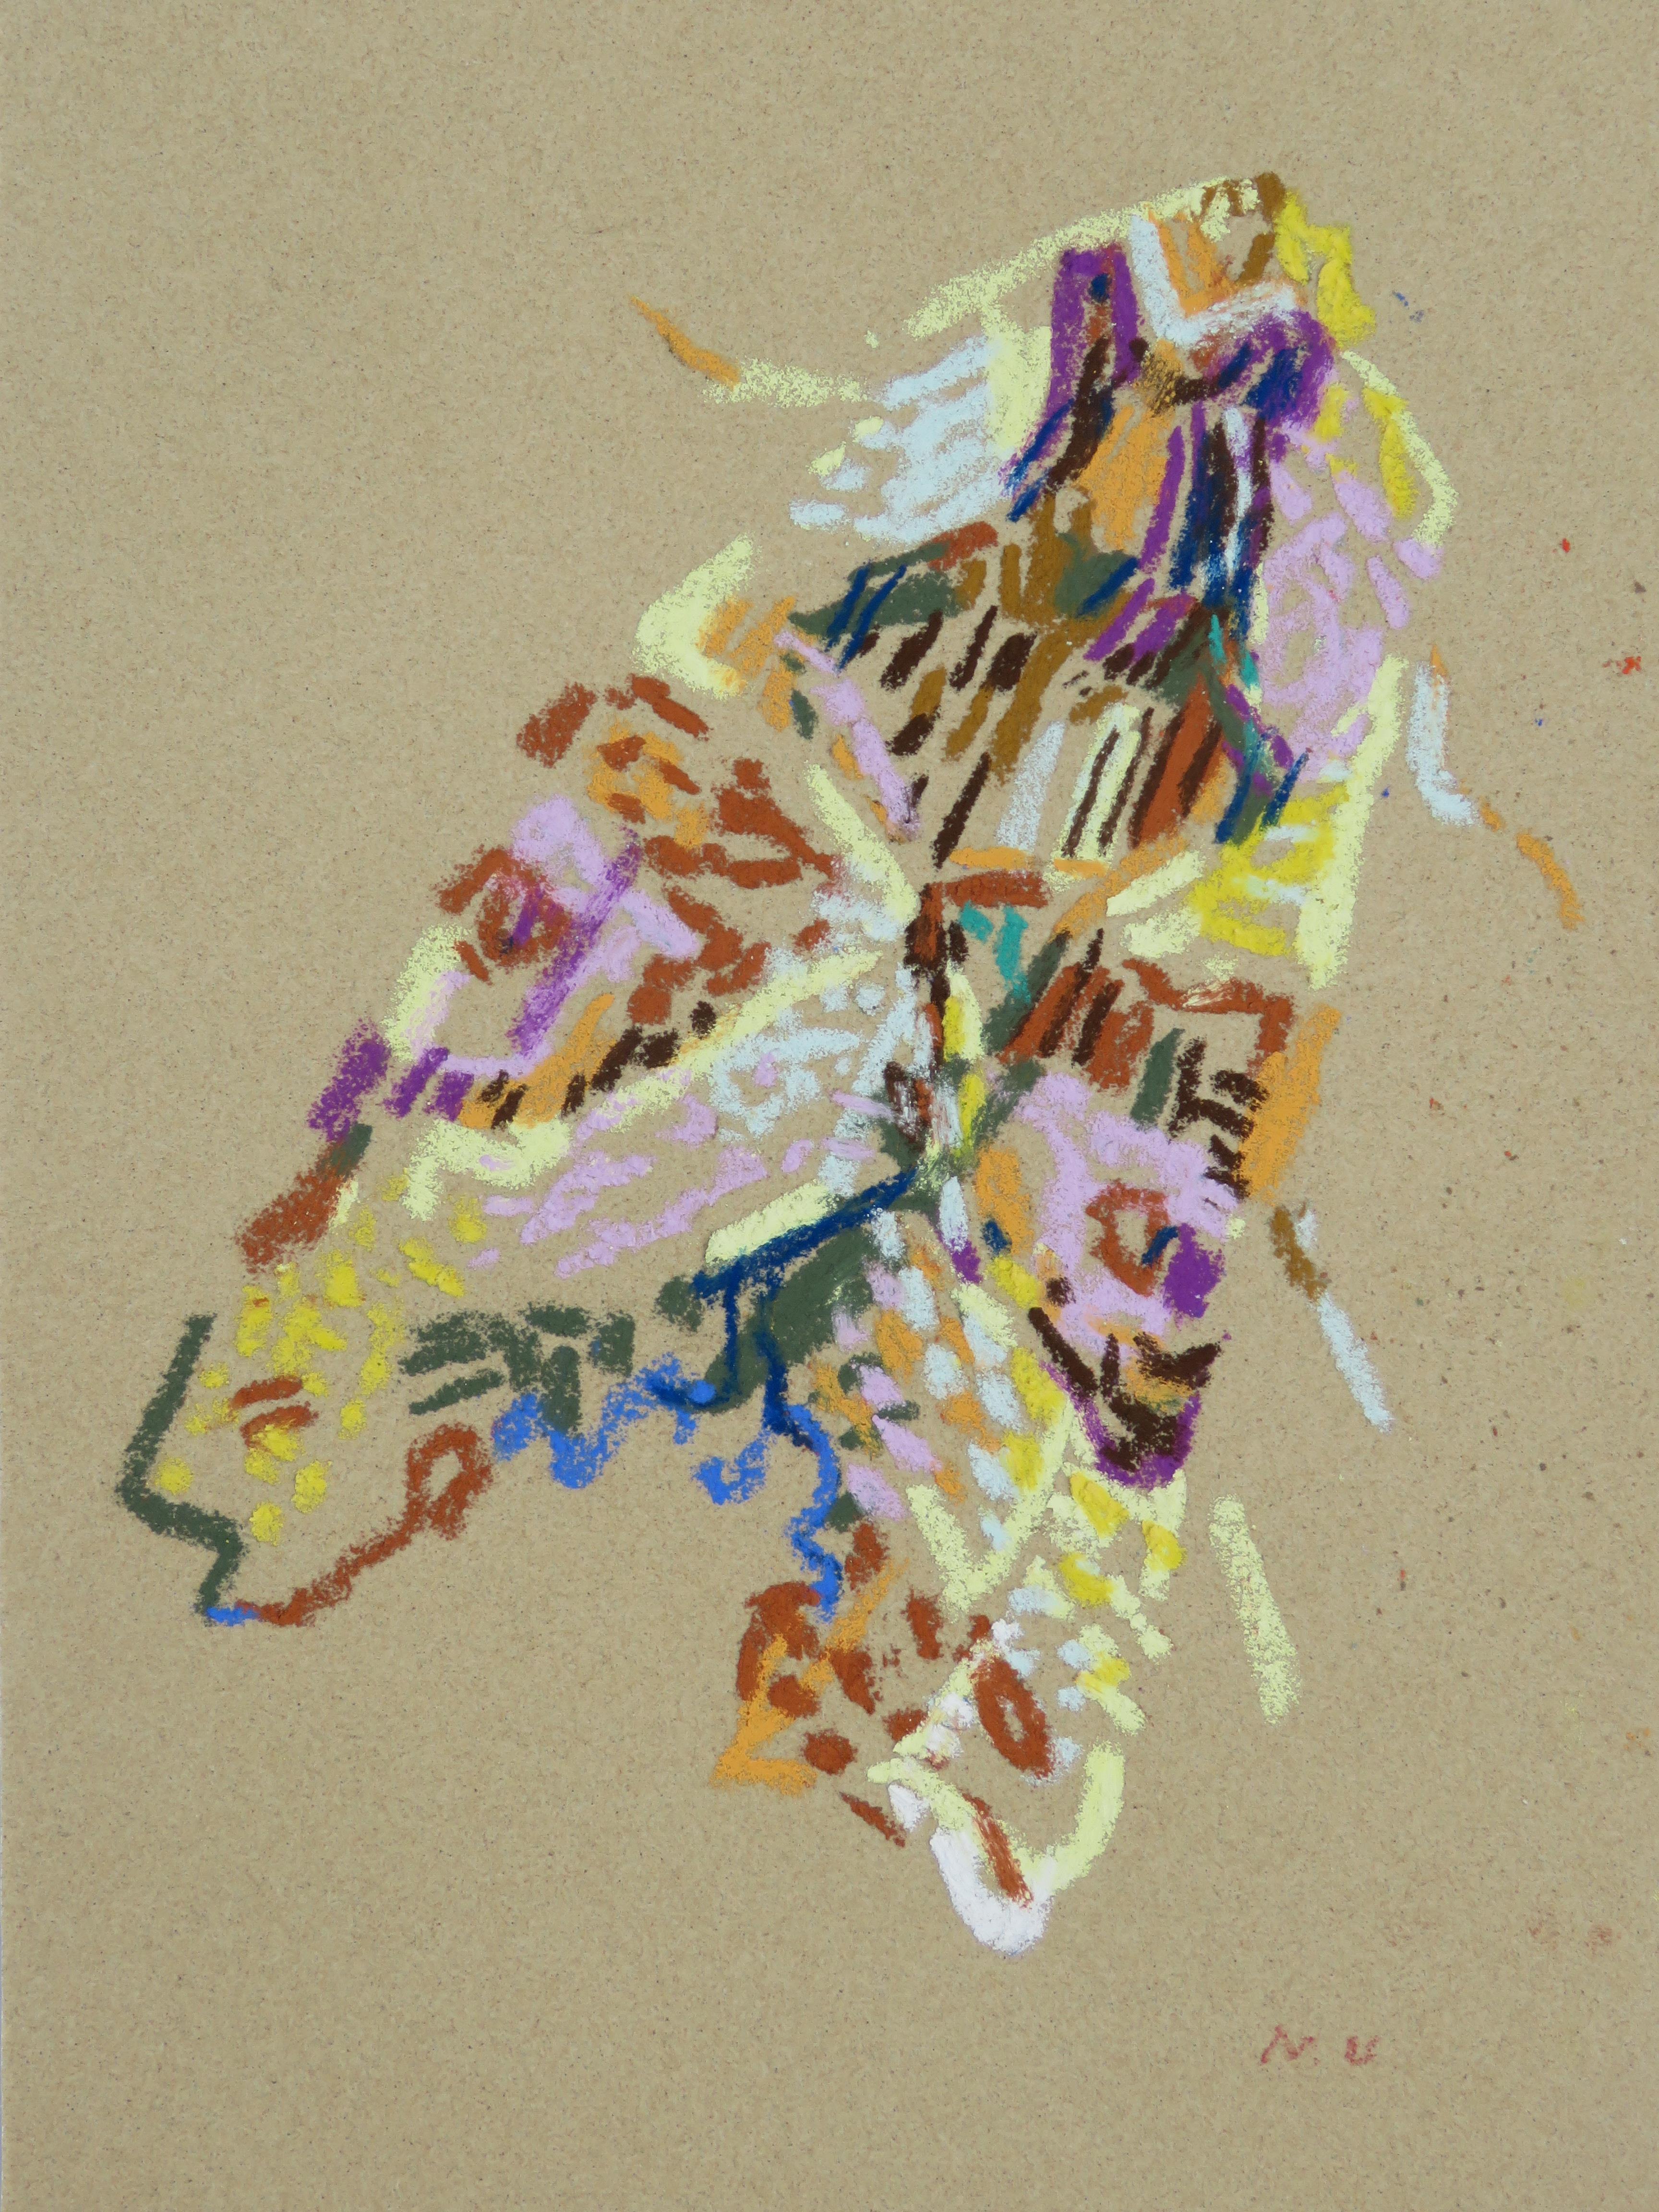 <p>Angel Shades study by Matt Underwood</p>